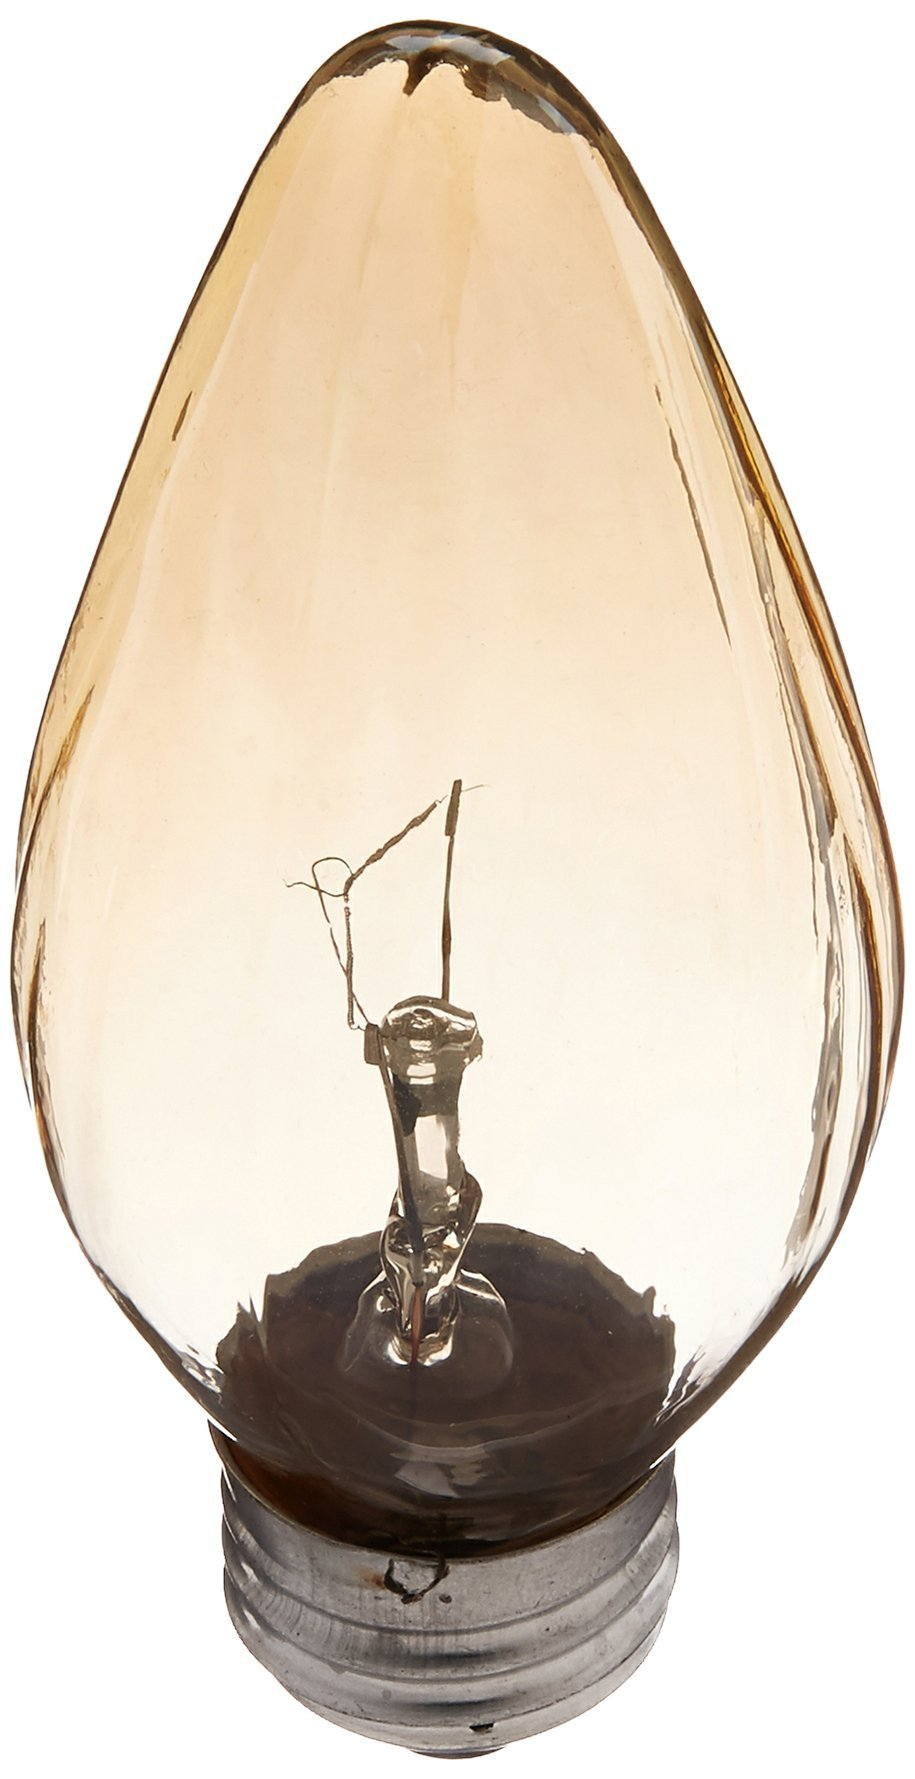 Sylvania 13823 - 25F/AIC/BL/2PK 120V F15 Decor Flame Tip Light Bulb 2 Lamps